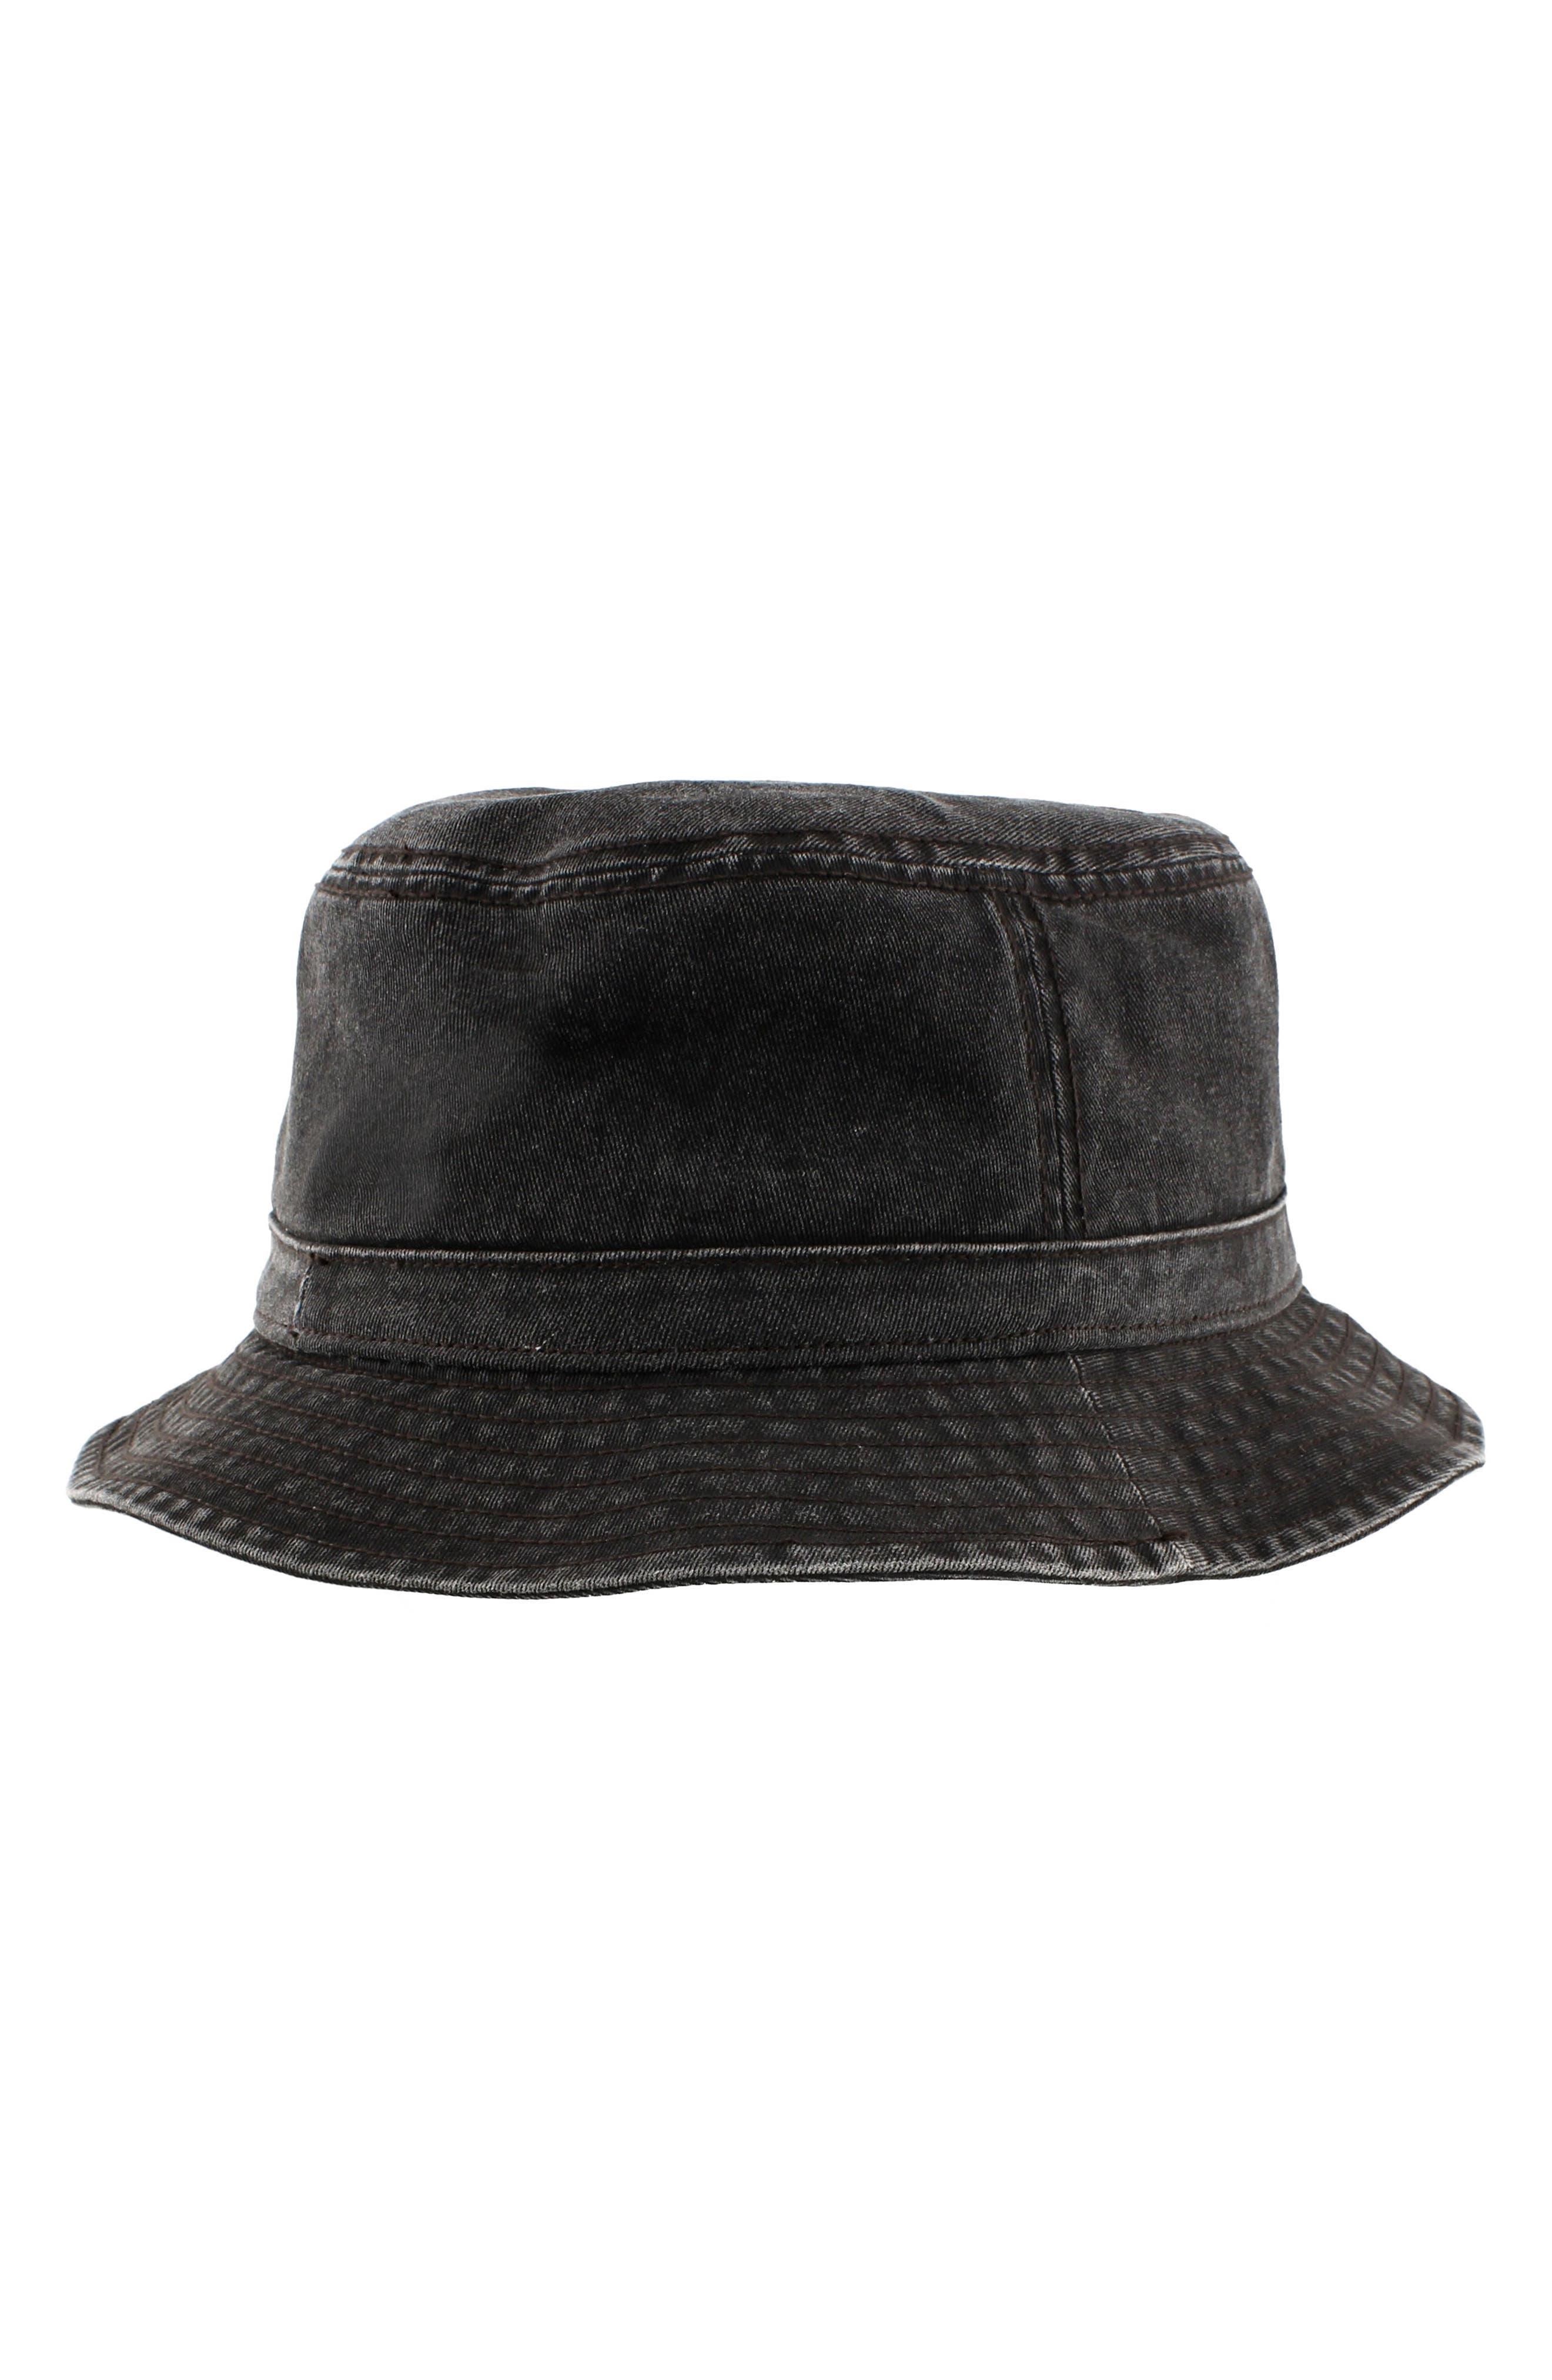 Washed Bucket Hat,                             Alternate thumbnail 4, color,                             Black/ Black